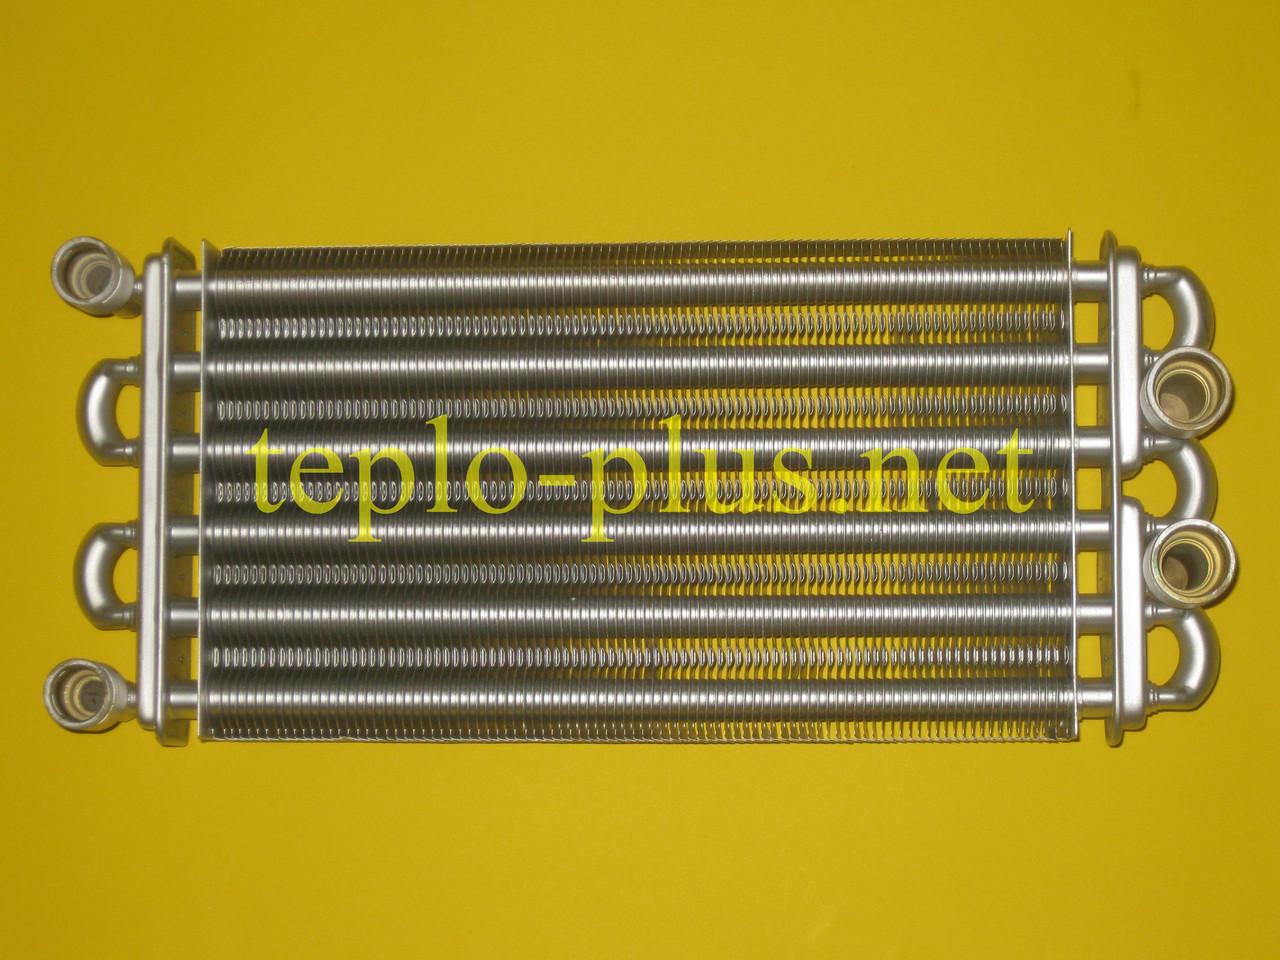 Теплообменник котел прага Пластинчатый теплообменник Thermowave TL-0250 Балаково